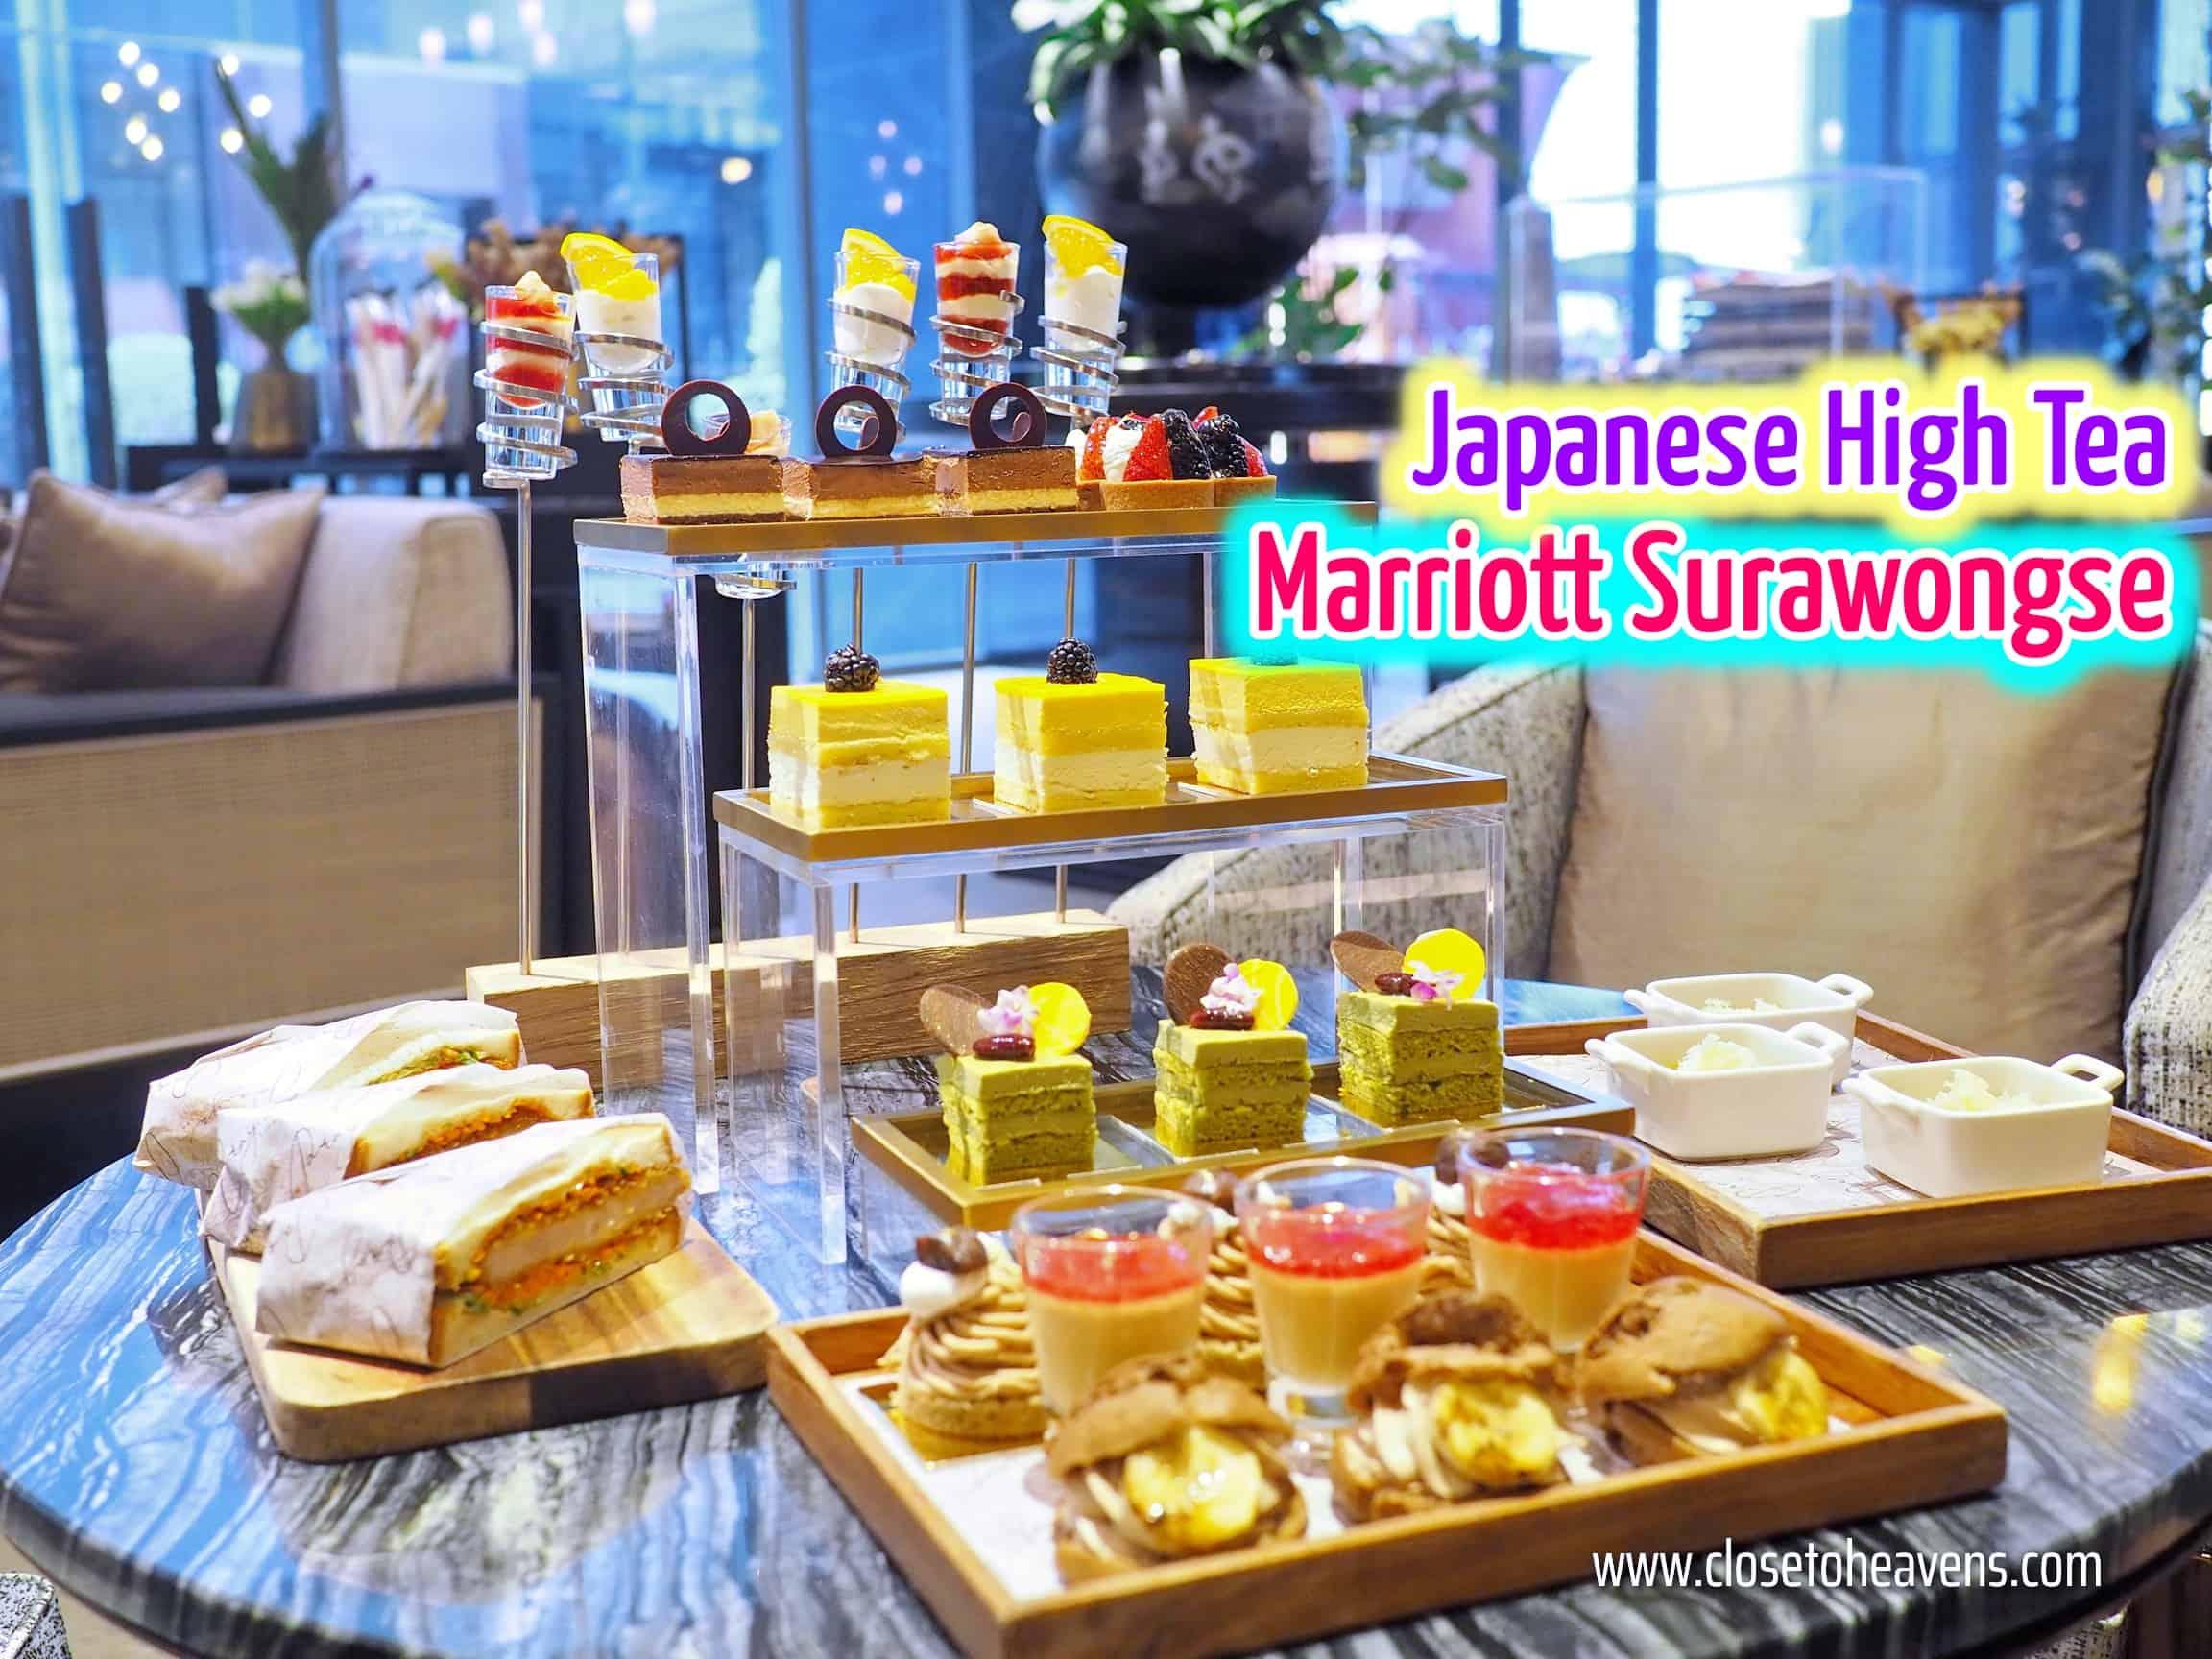 Japanese High Tea Marriott Surawongse